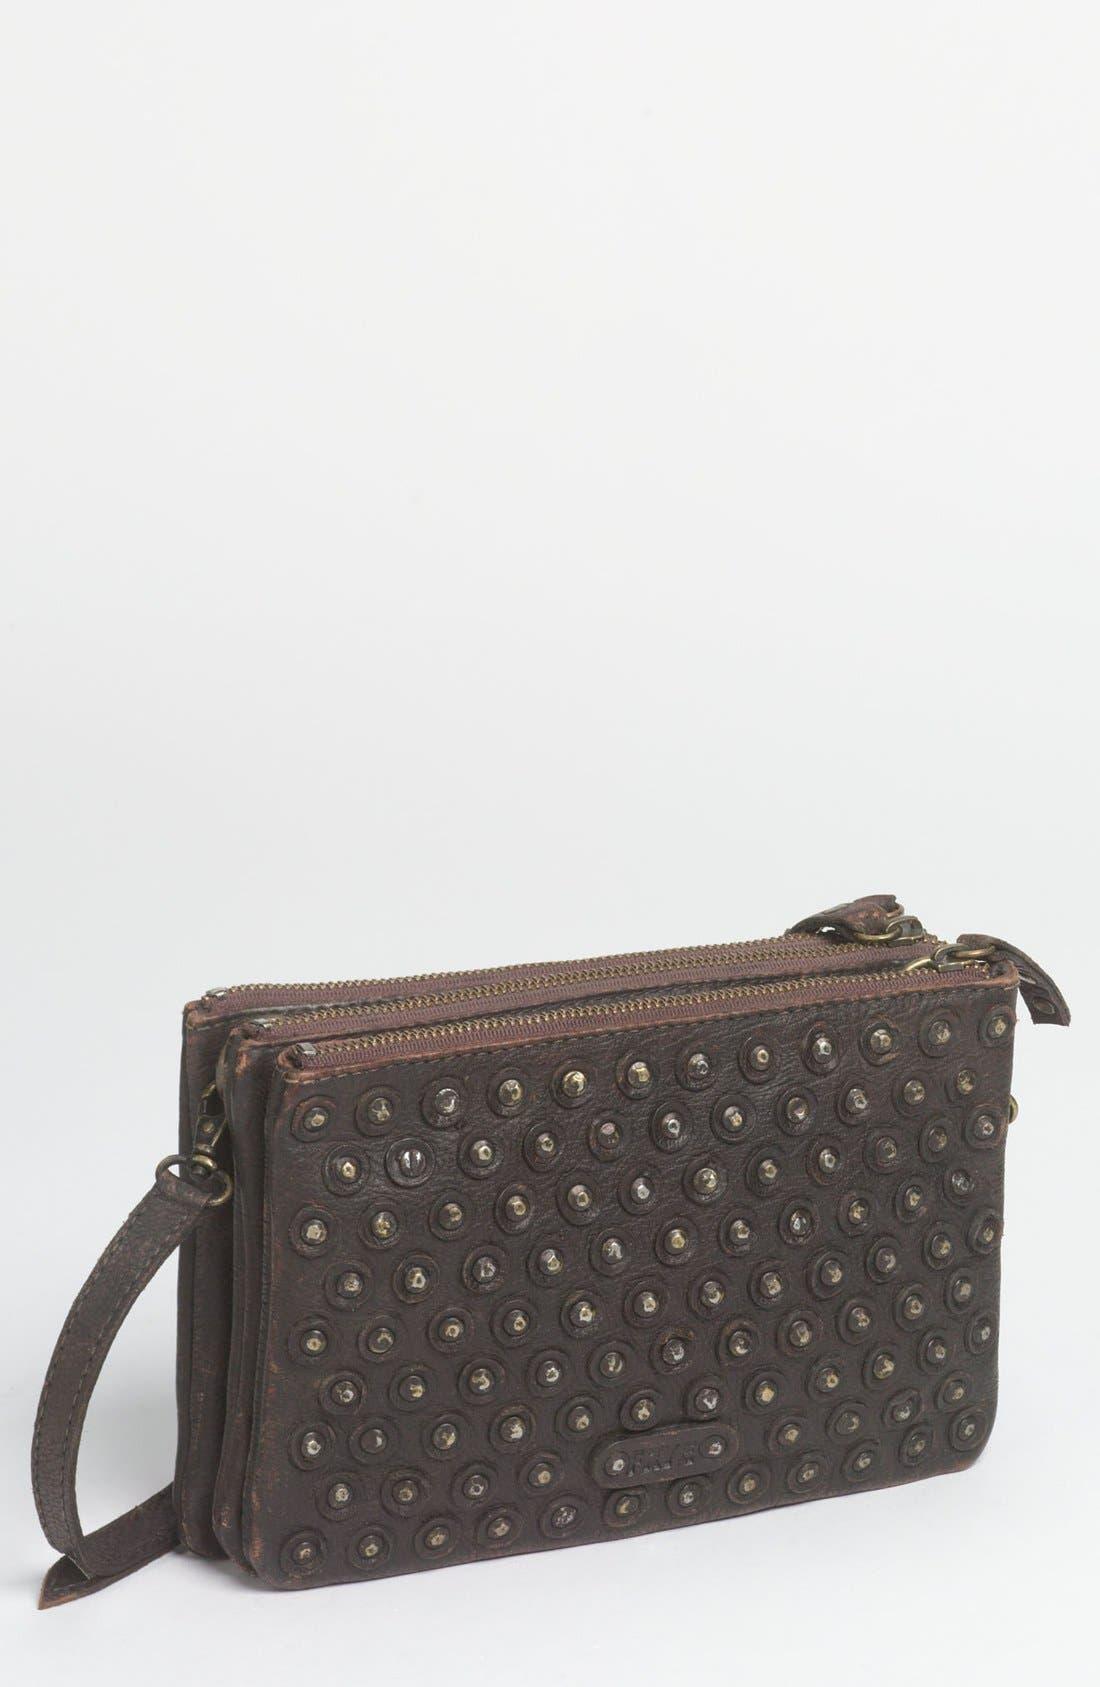 Main Image - Frye 'Jenna' Crossbody Bag, Small